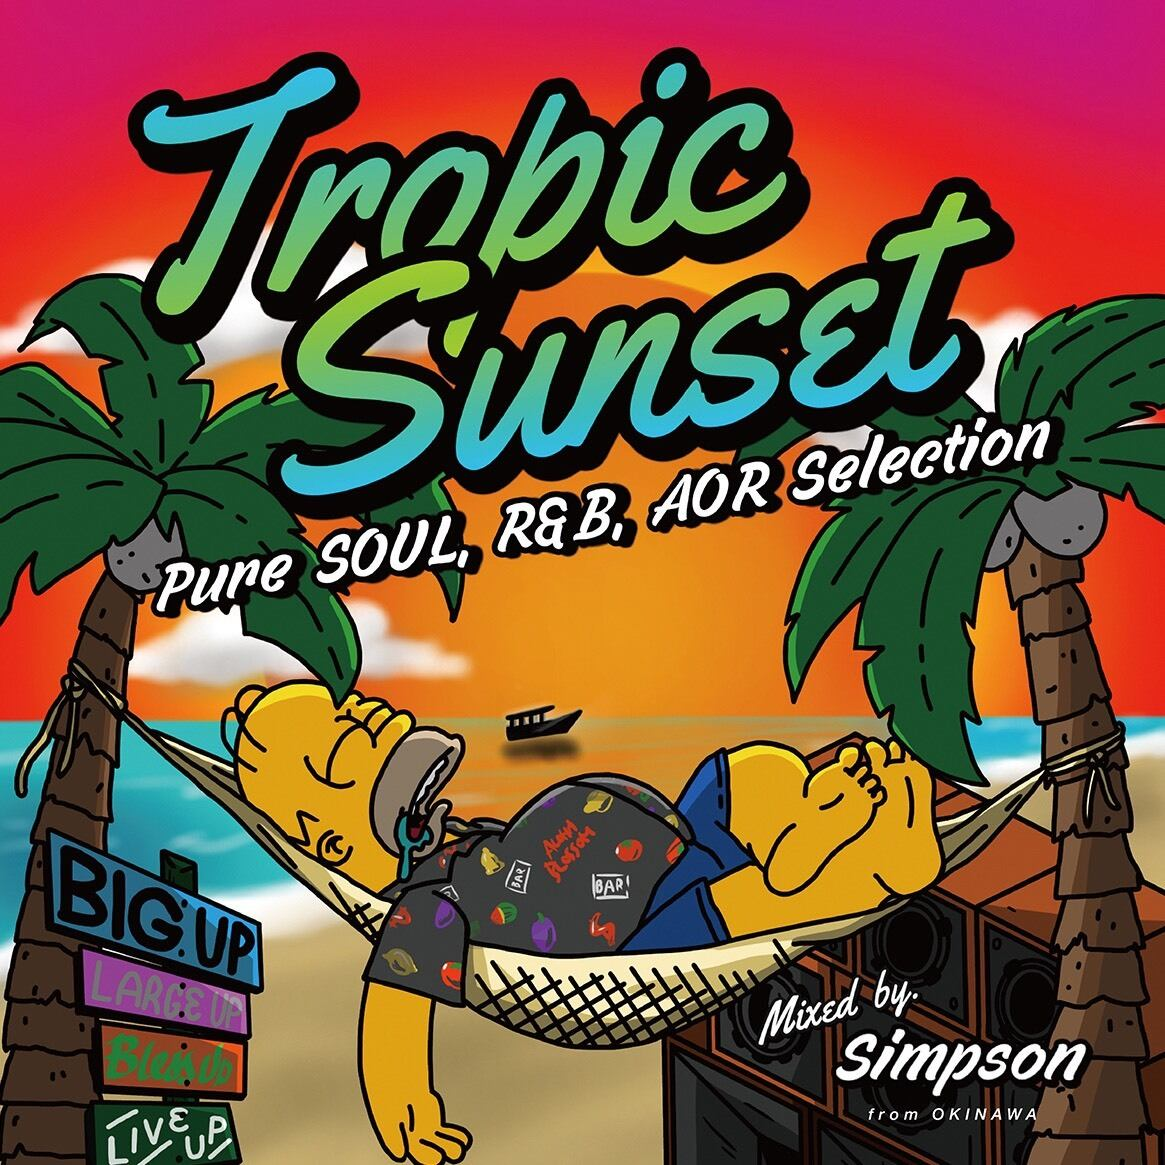 Tropic Sunset / SIMPSON